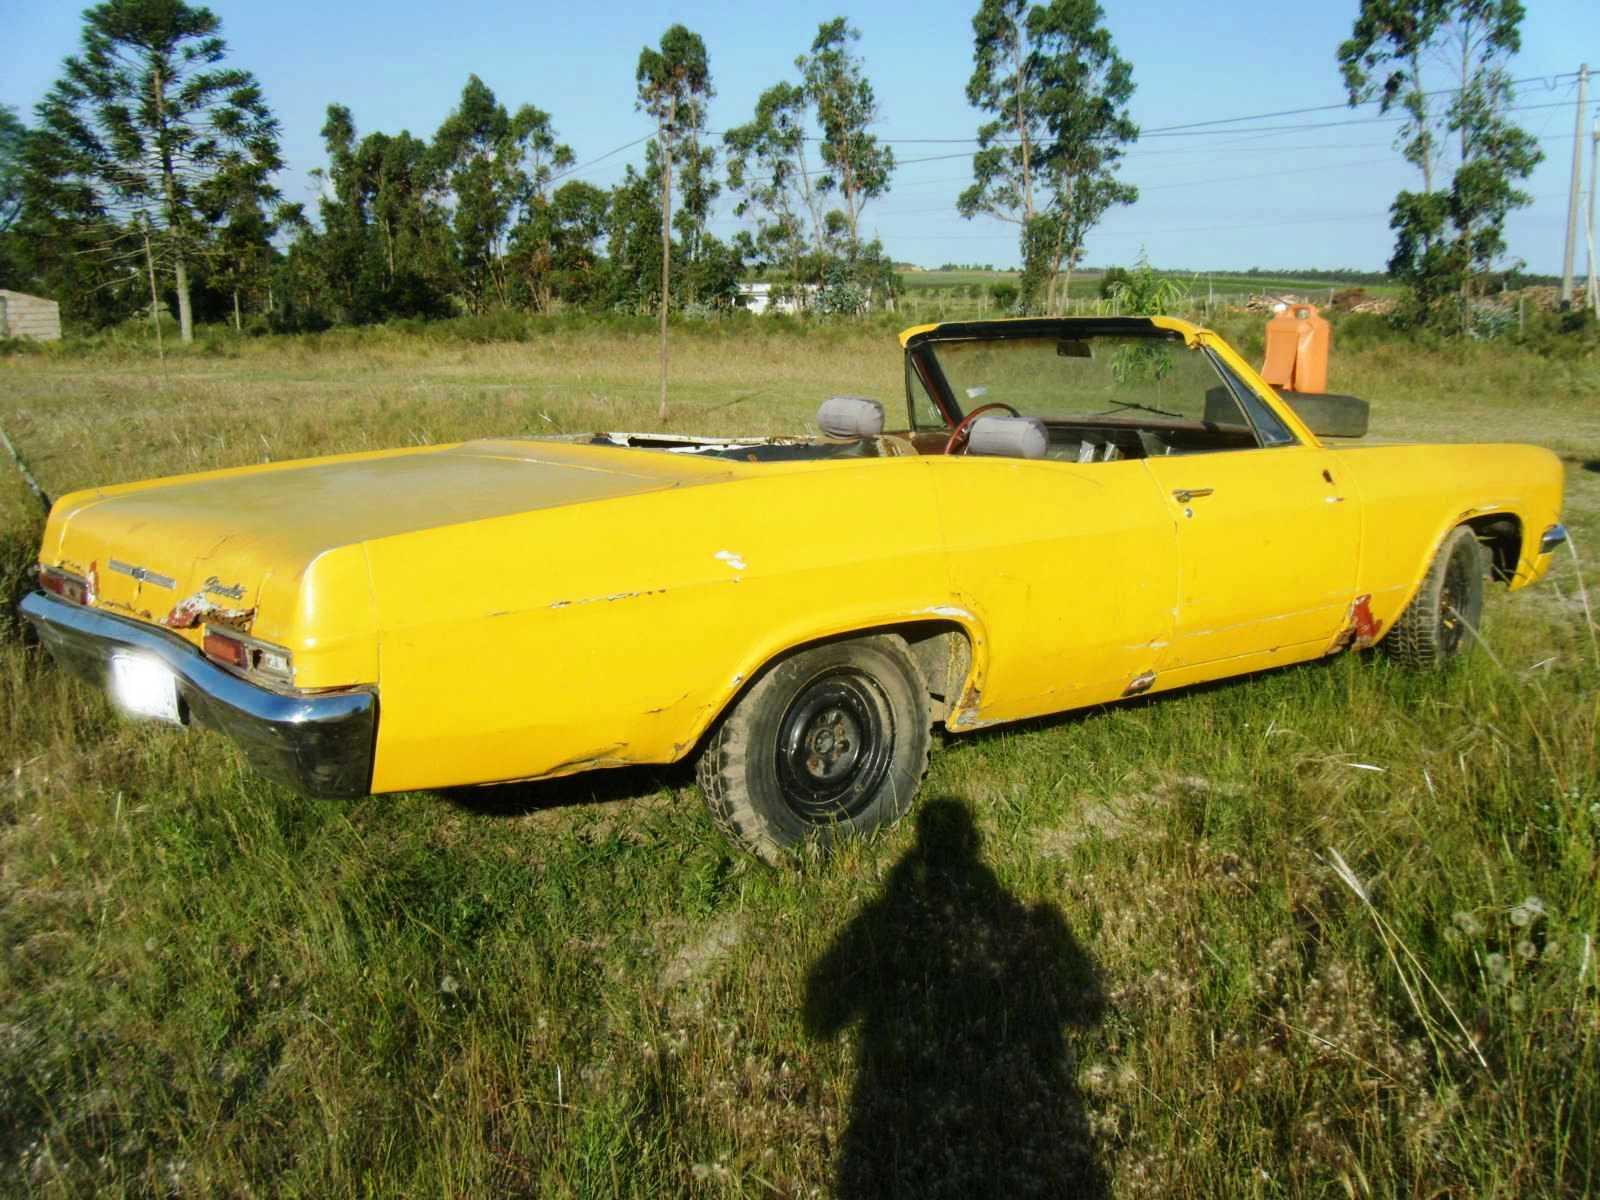 upablo-che-imp Chevrolet Impala (1966 - convertible)